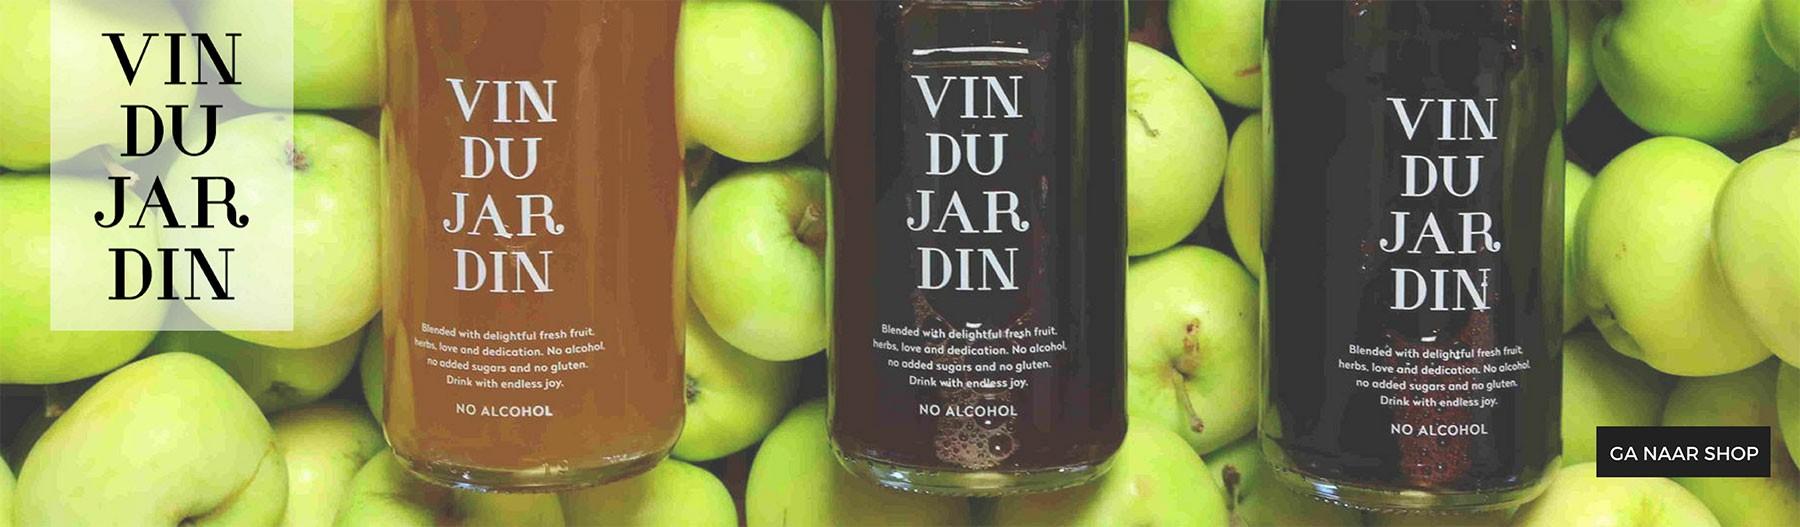 Vin Du Jardin